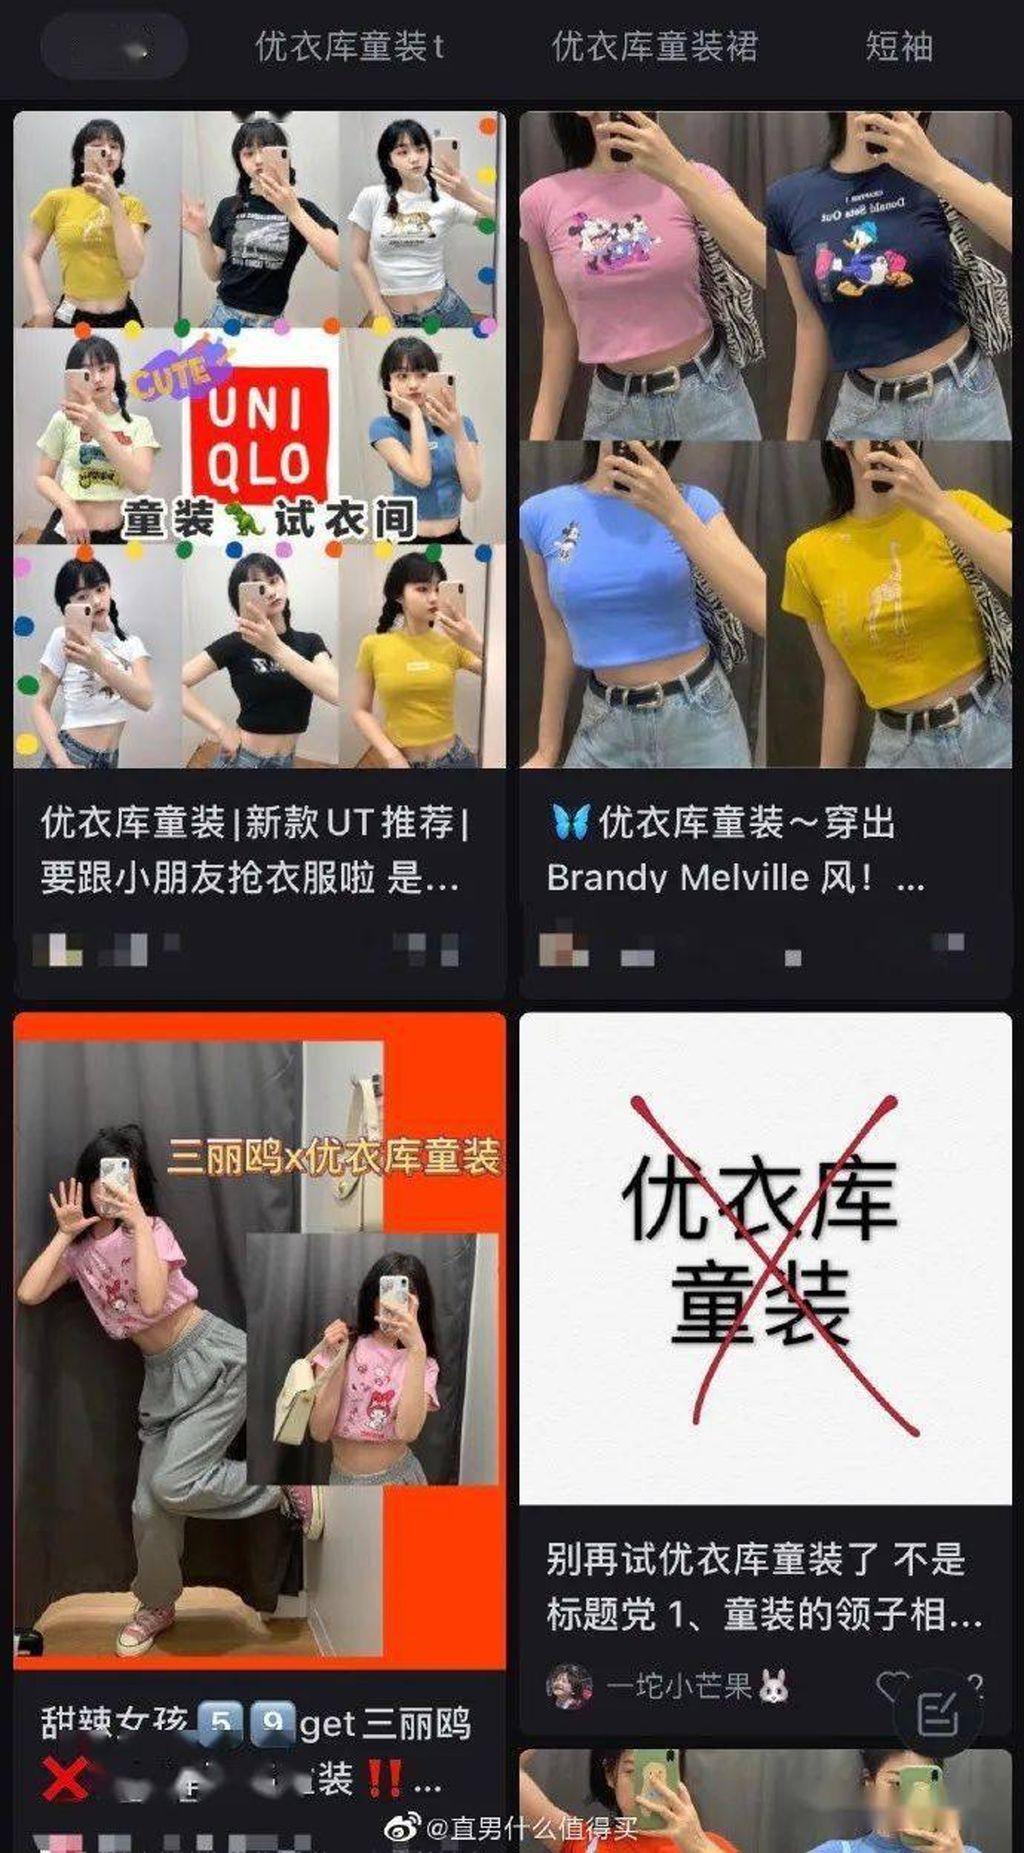 Tren aneh di China pakai baju anak-anak